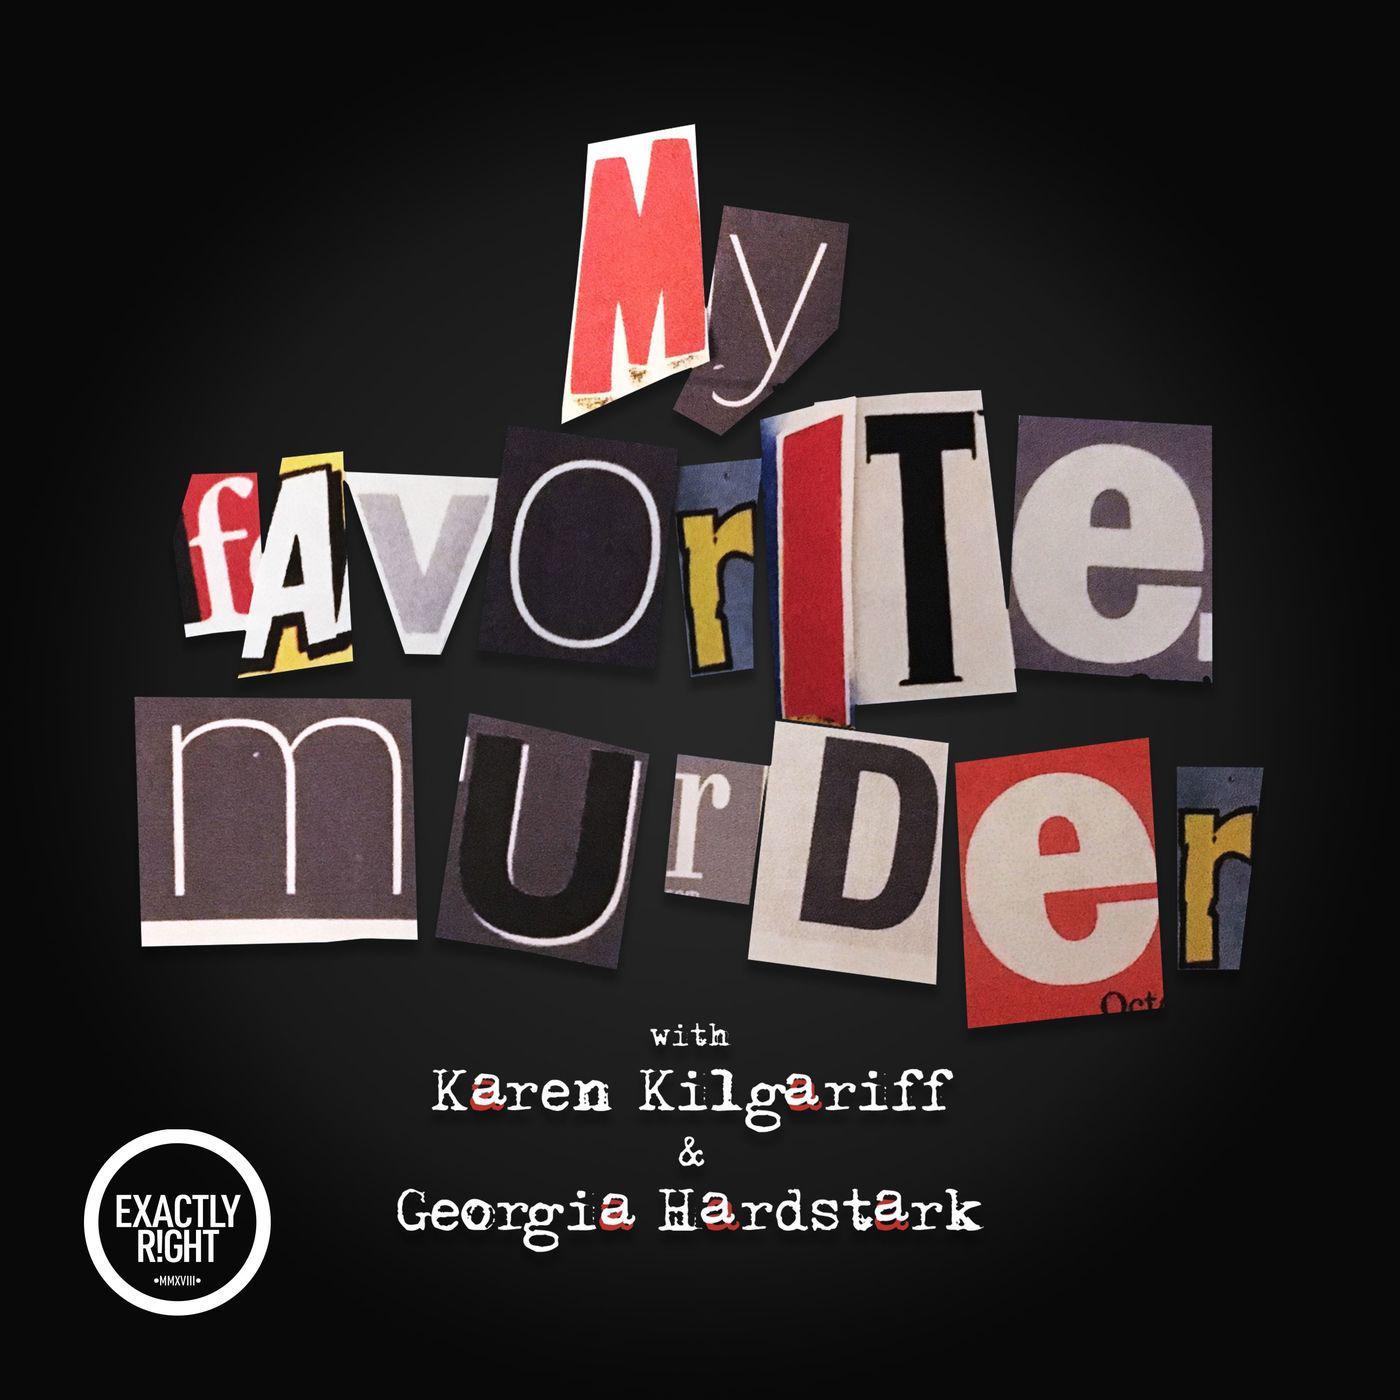 MFM Minisode 72 - My Favorite Murder with Karen Kilgariff and